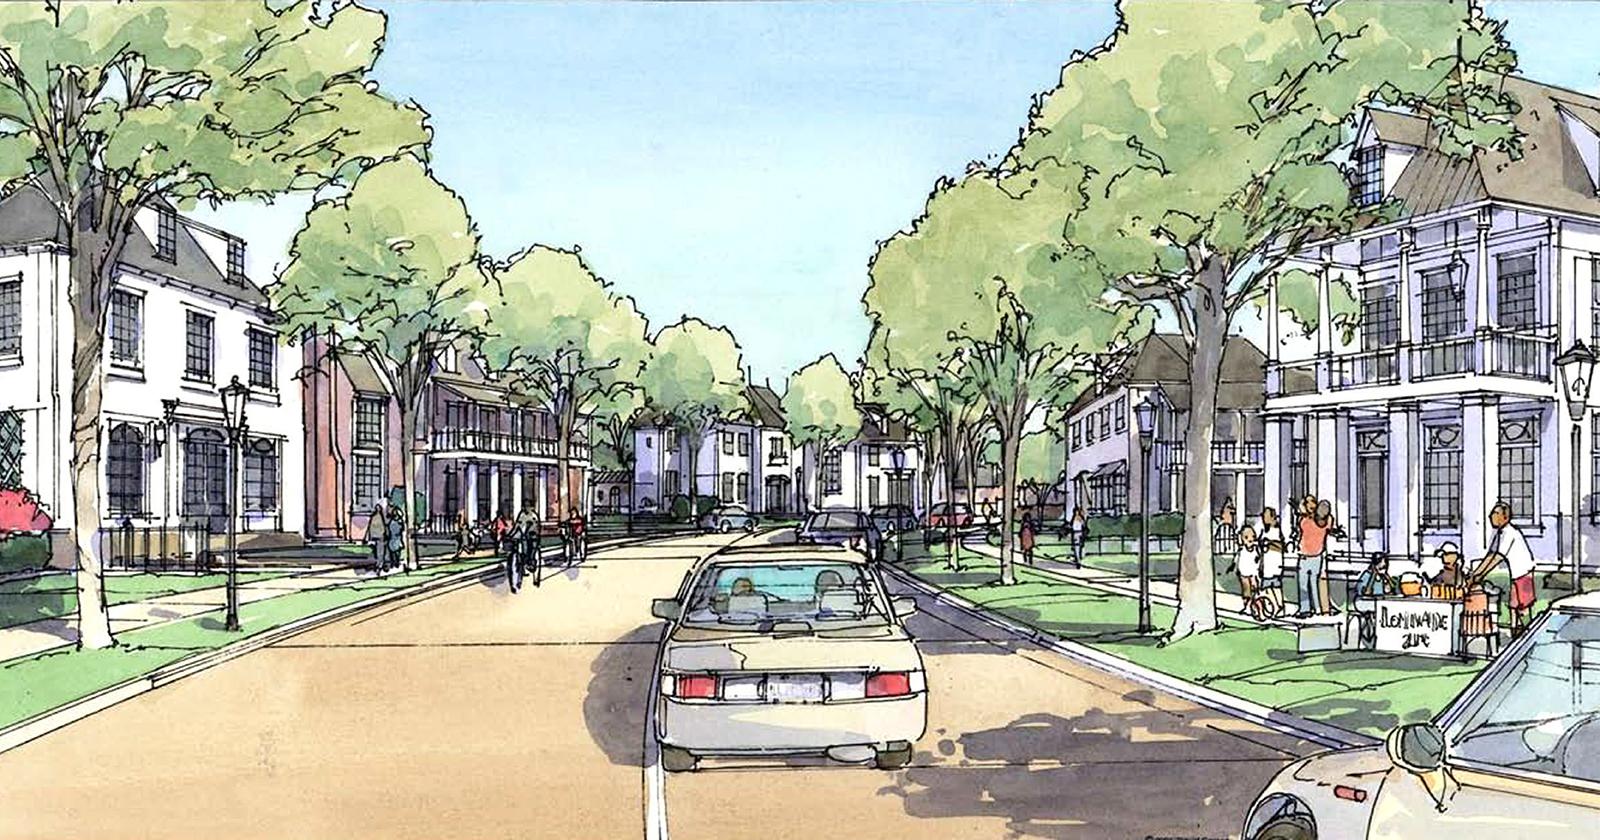 The Village of Rouzan, Baton Rouge, LA